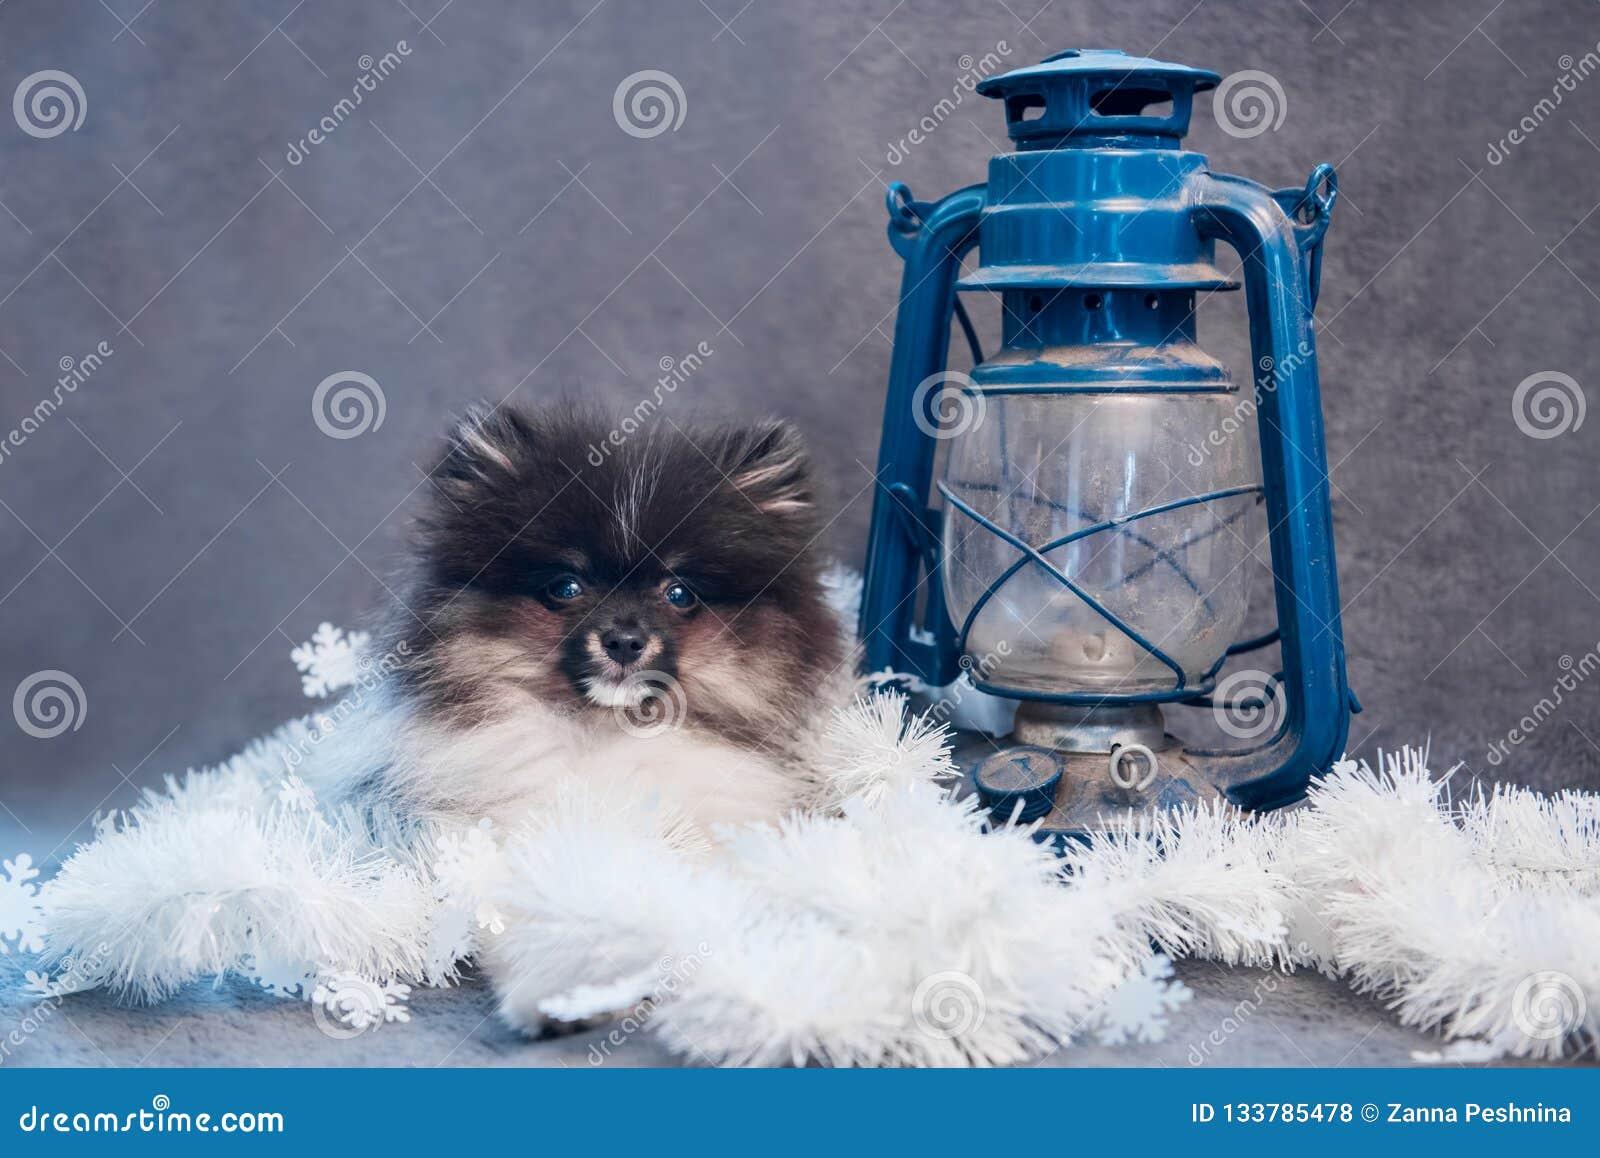 Pomeranian波美丝毛狗在诗歌选的狗小狗在圣诞节或新年